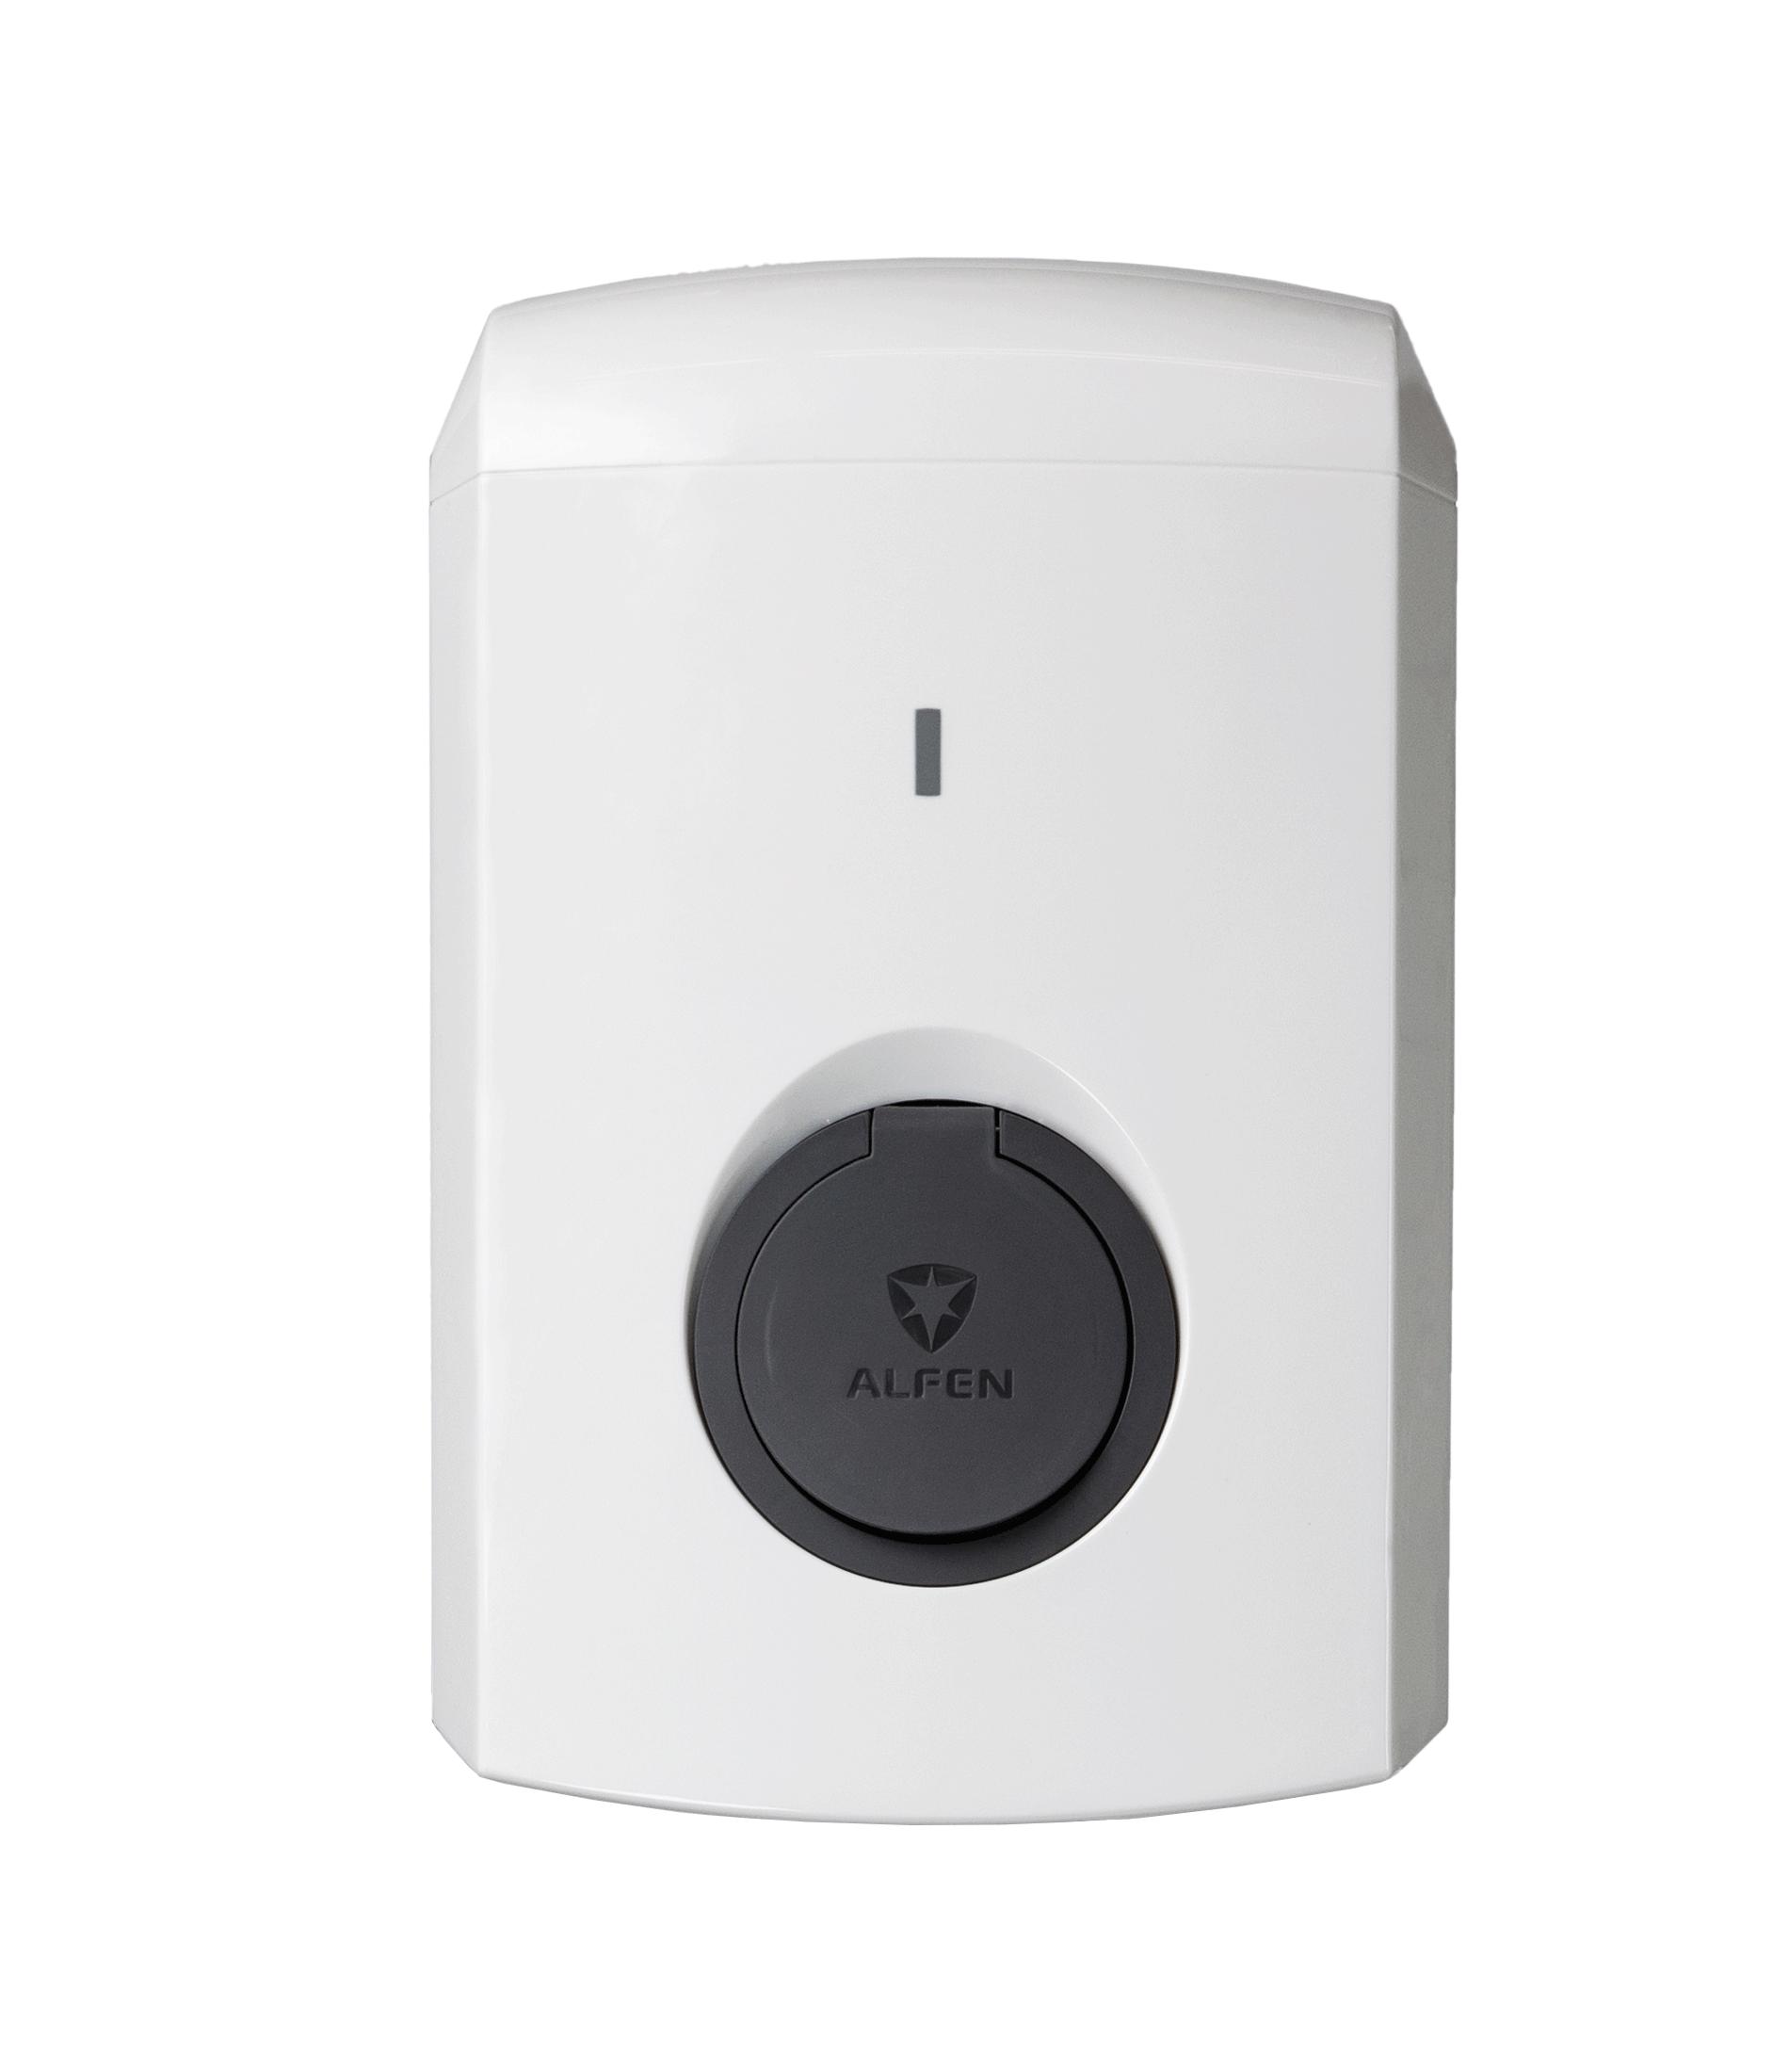 Alfen Eve Single S-line RFID 11 kW